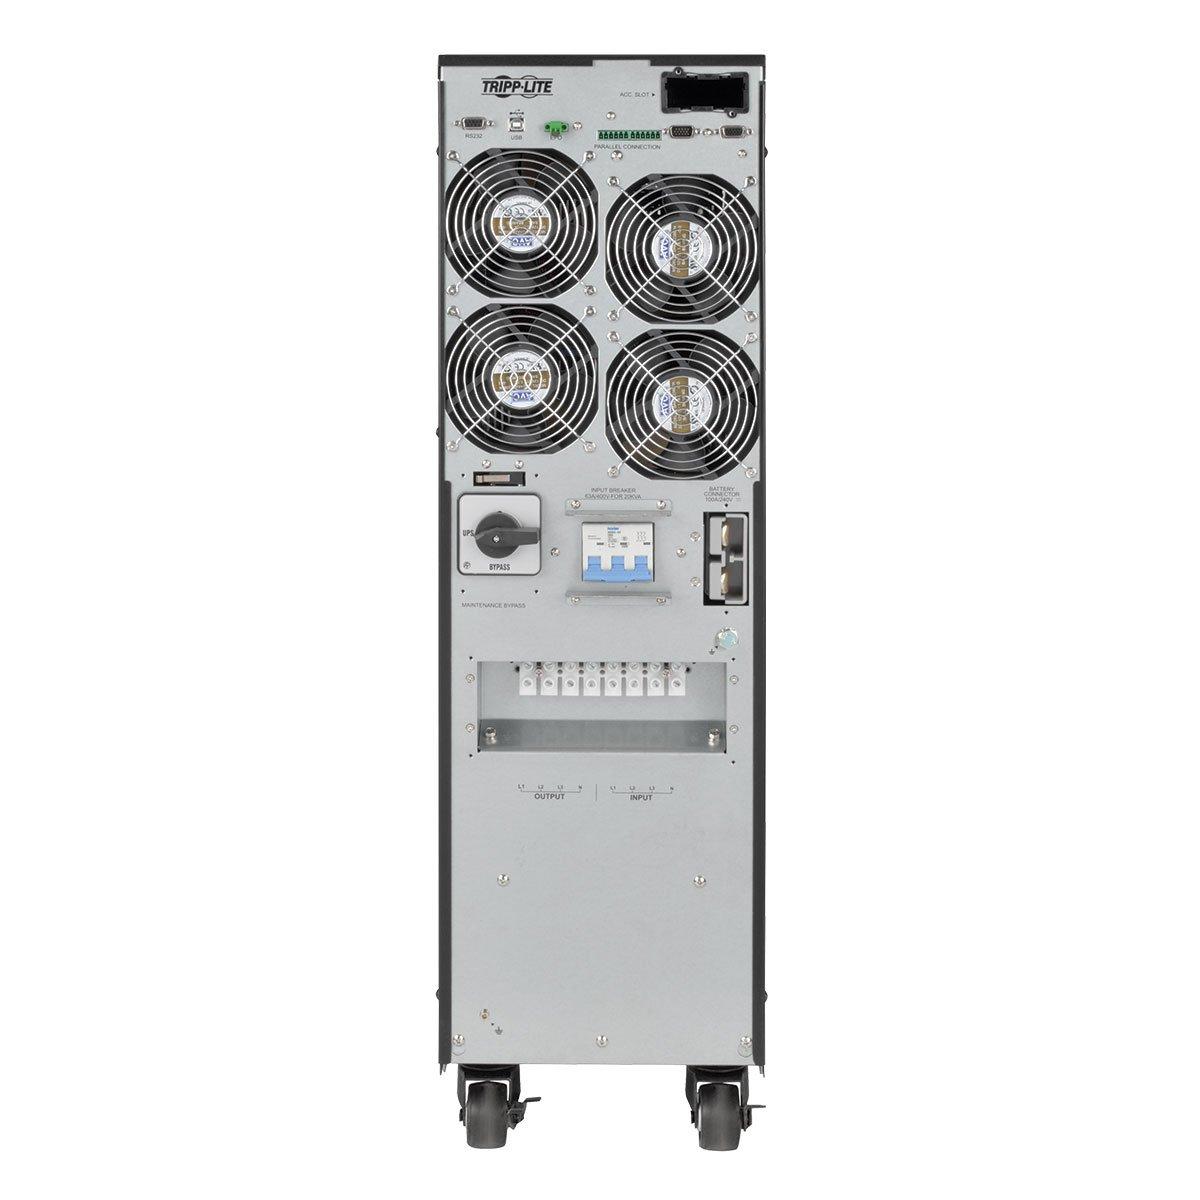 An image of Tripp lite smartonline svtx series 3-phase 380/400/415v 20kva 18kw on-line doubl...